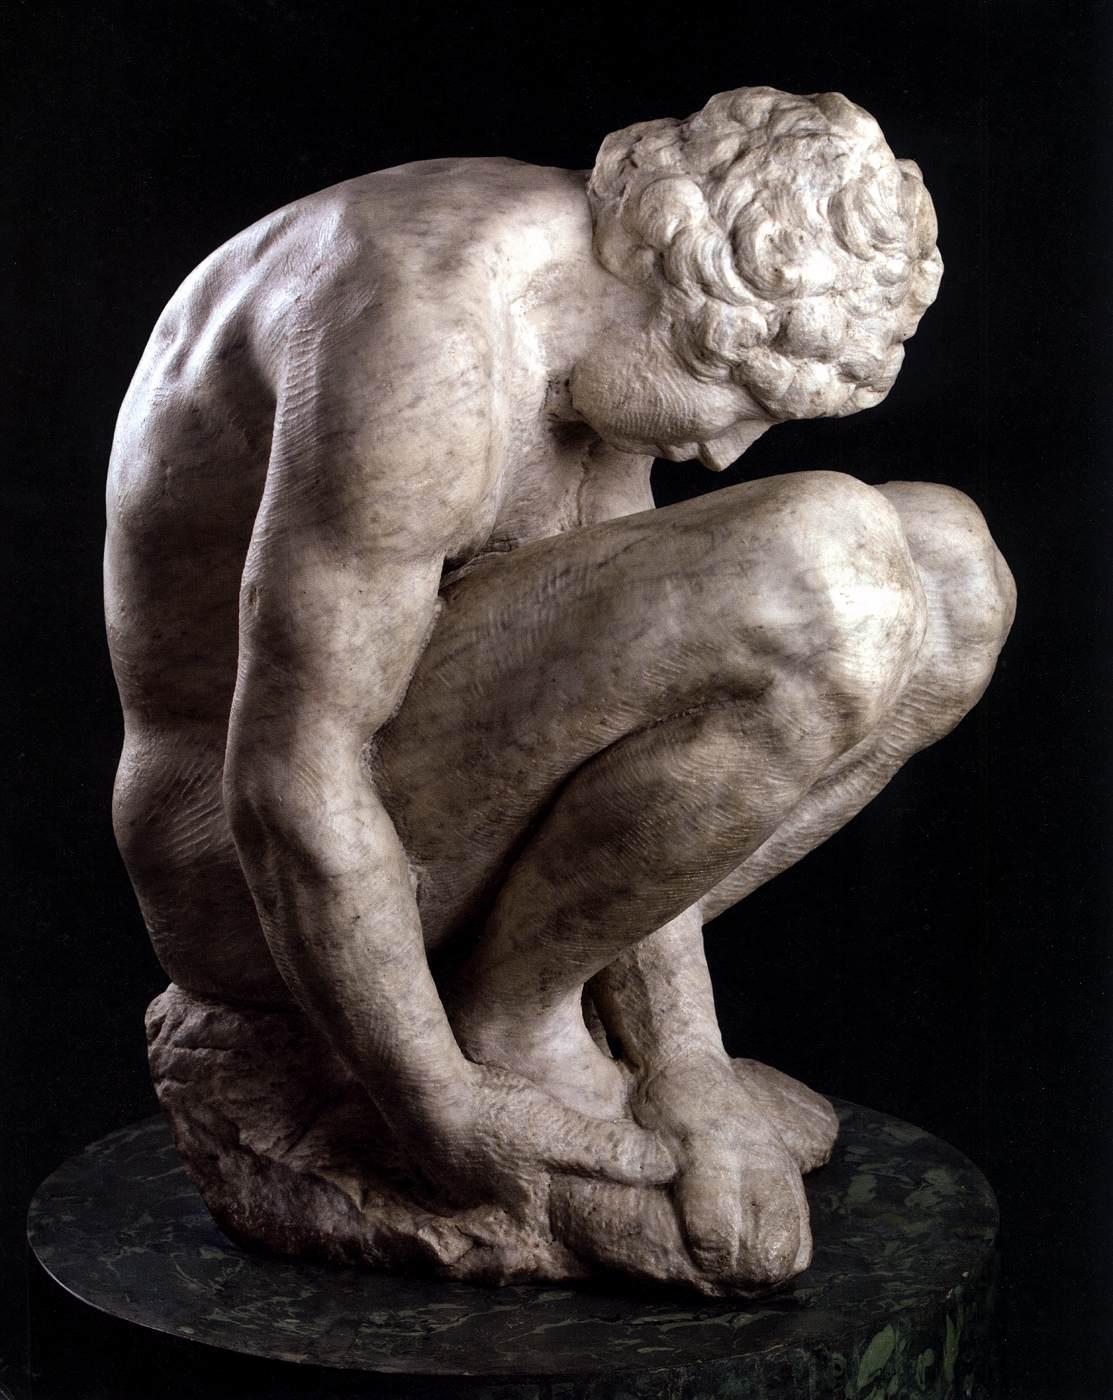 crouching-boy-michelangelo-1530.jpg